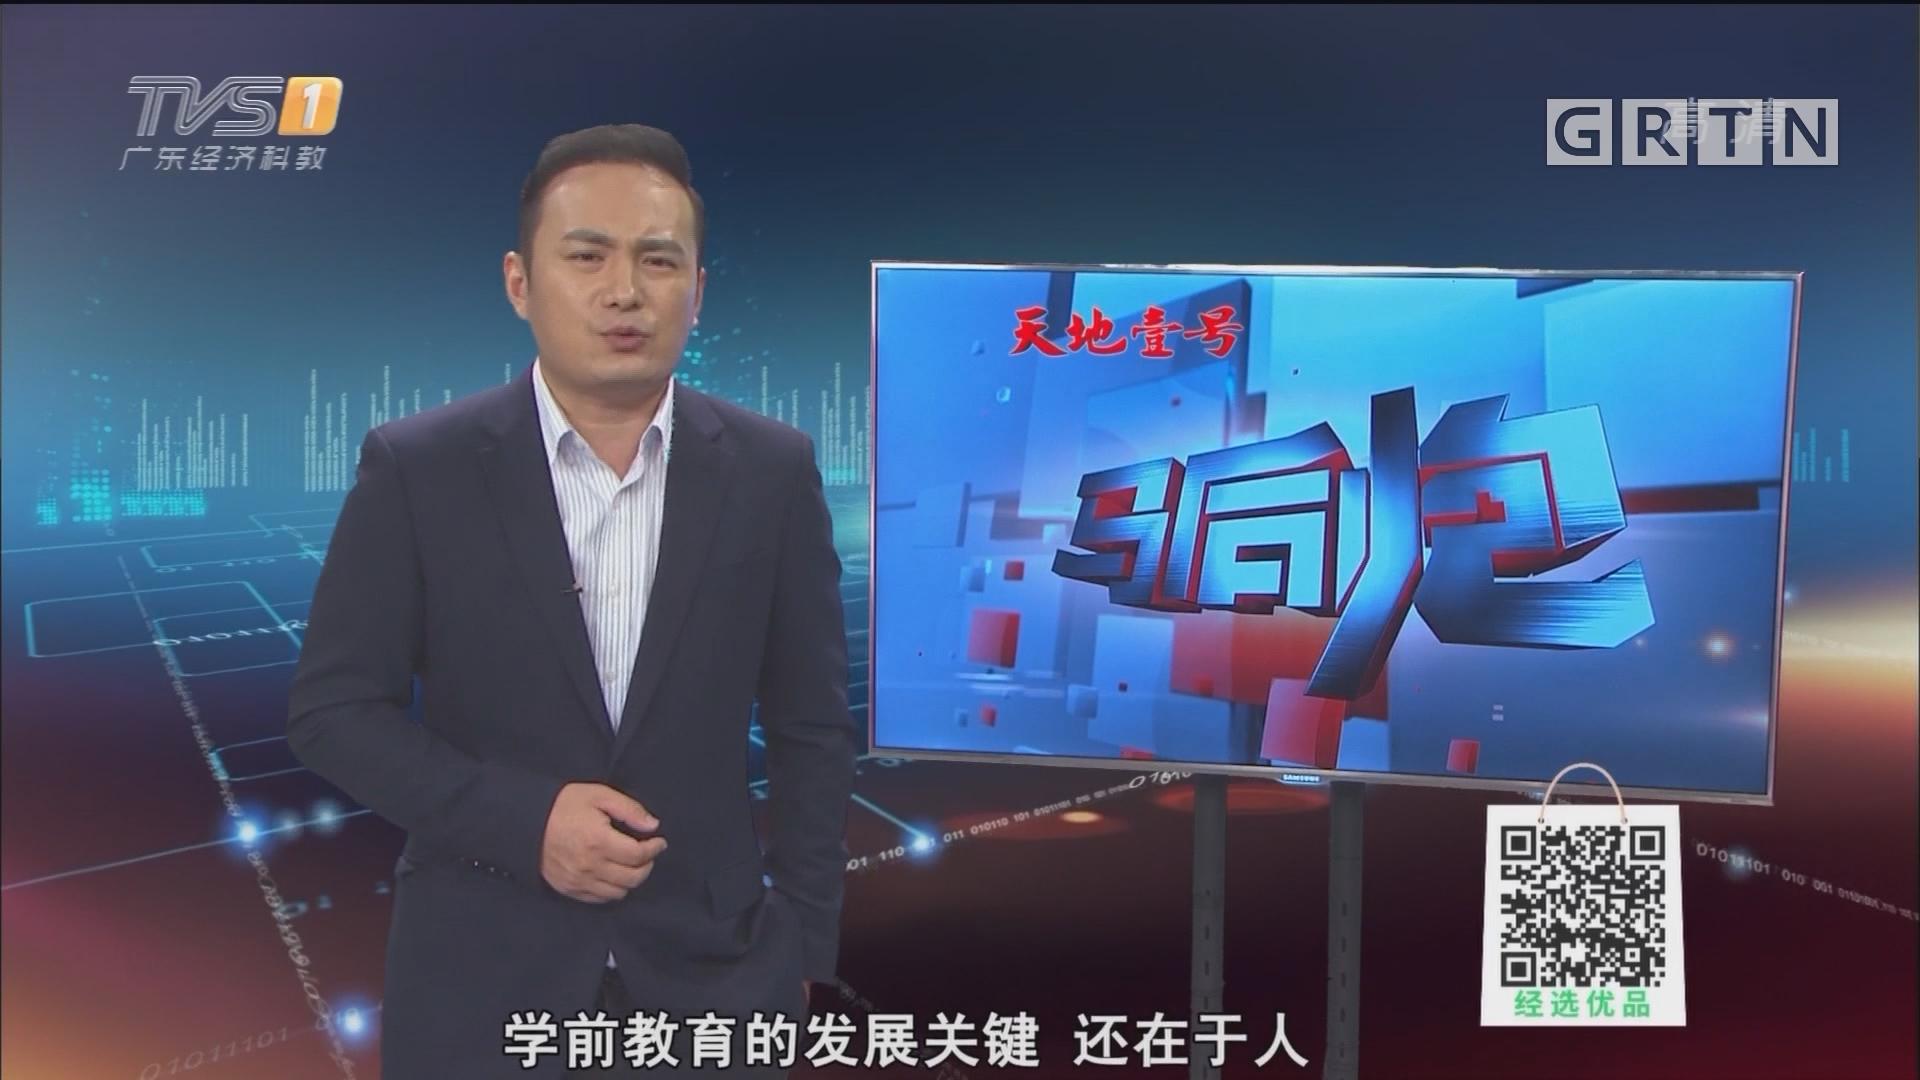 [HD][2019-04-30]马后炮:当我们谈论《复联》时 我们在谈论什么?